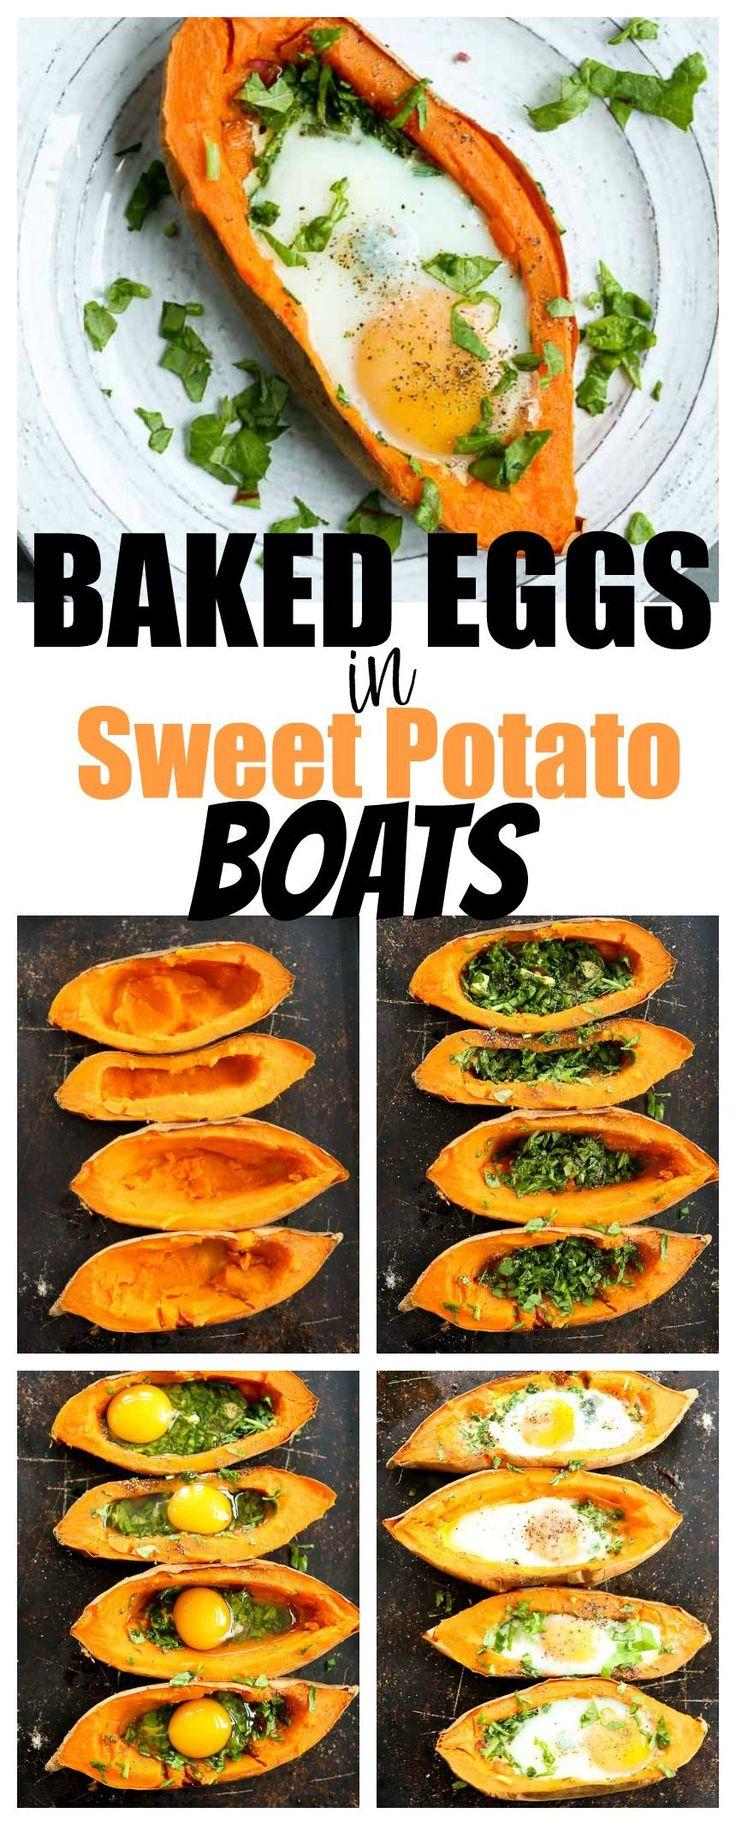 baked eggs in sweet potato recipe   healthy breakfast   sweet potato recipes   low carb   vegetarian   gluten-free   Paleo (eating healthy breakfast)